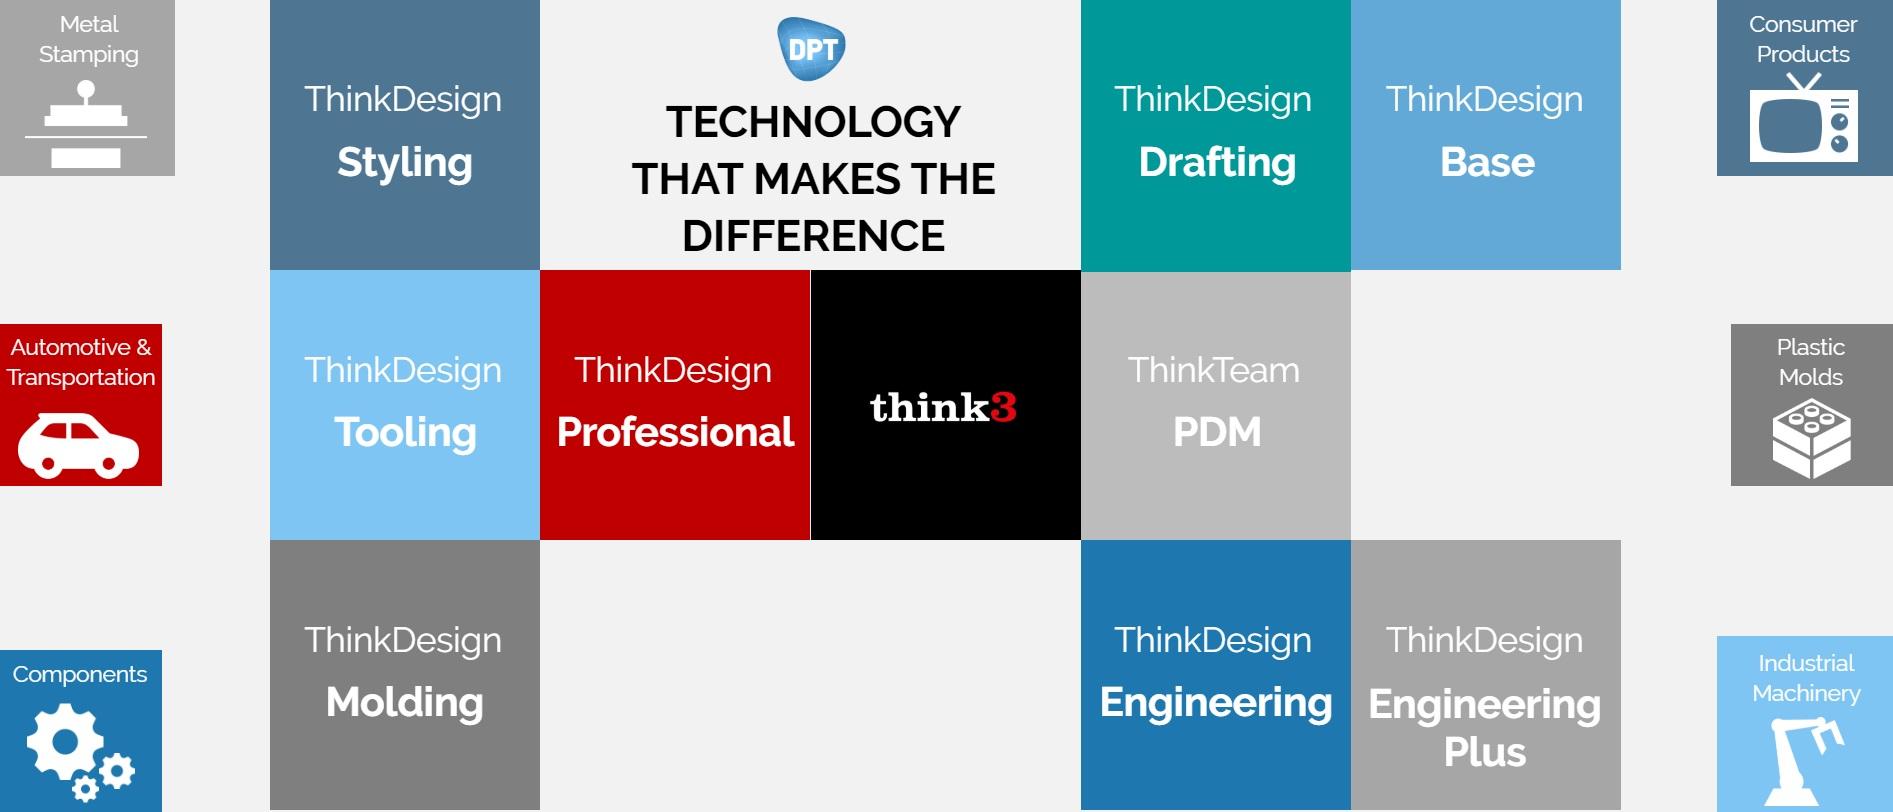 DPT Think3